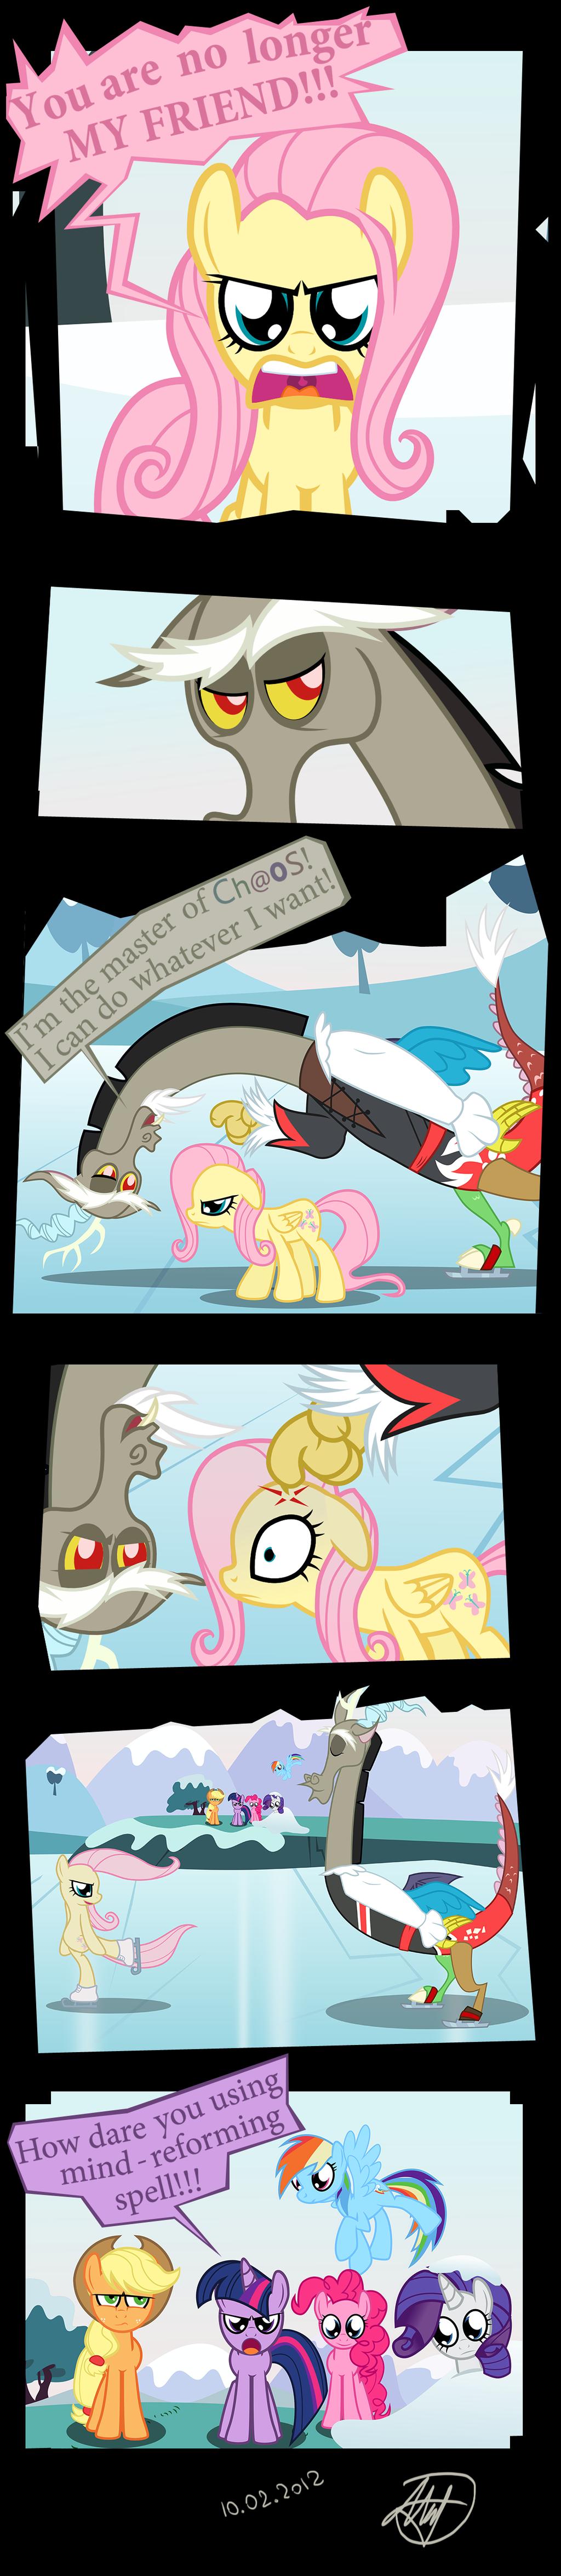 Friendship is Magic. mafon.deviantart.com/art/Friendship-i..... I did not know of any rules. ponies comic